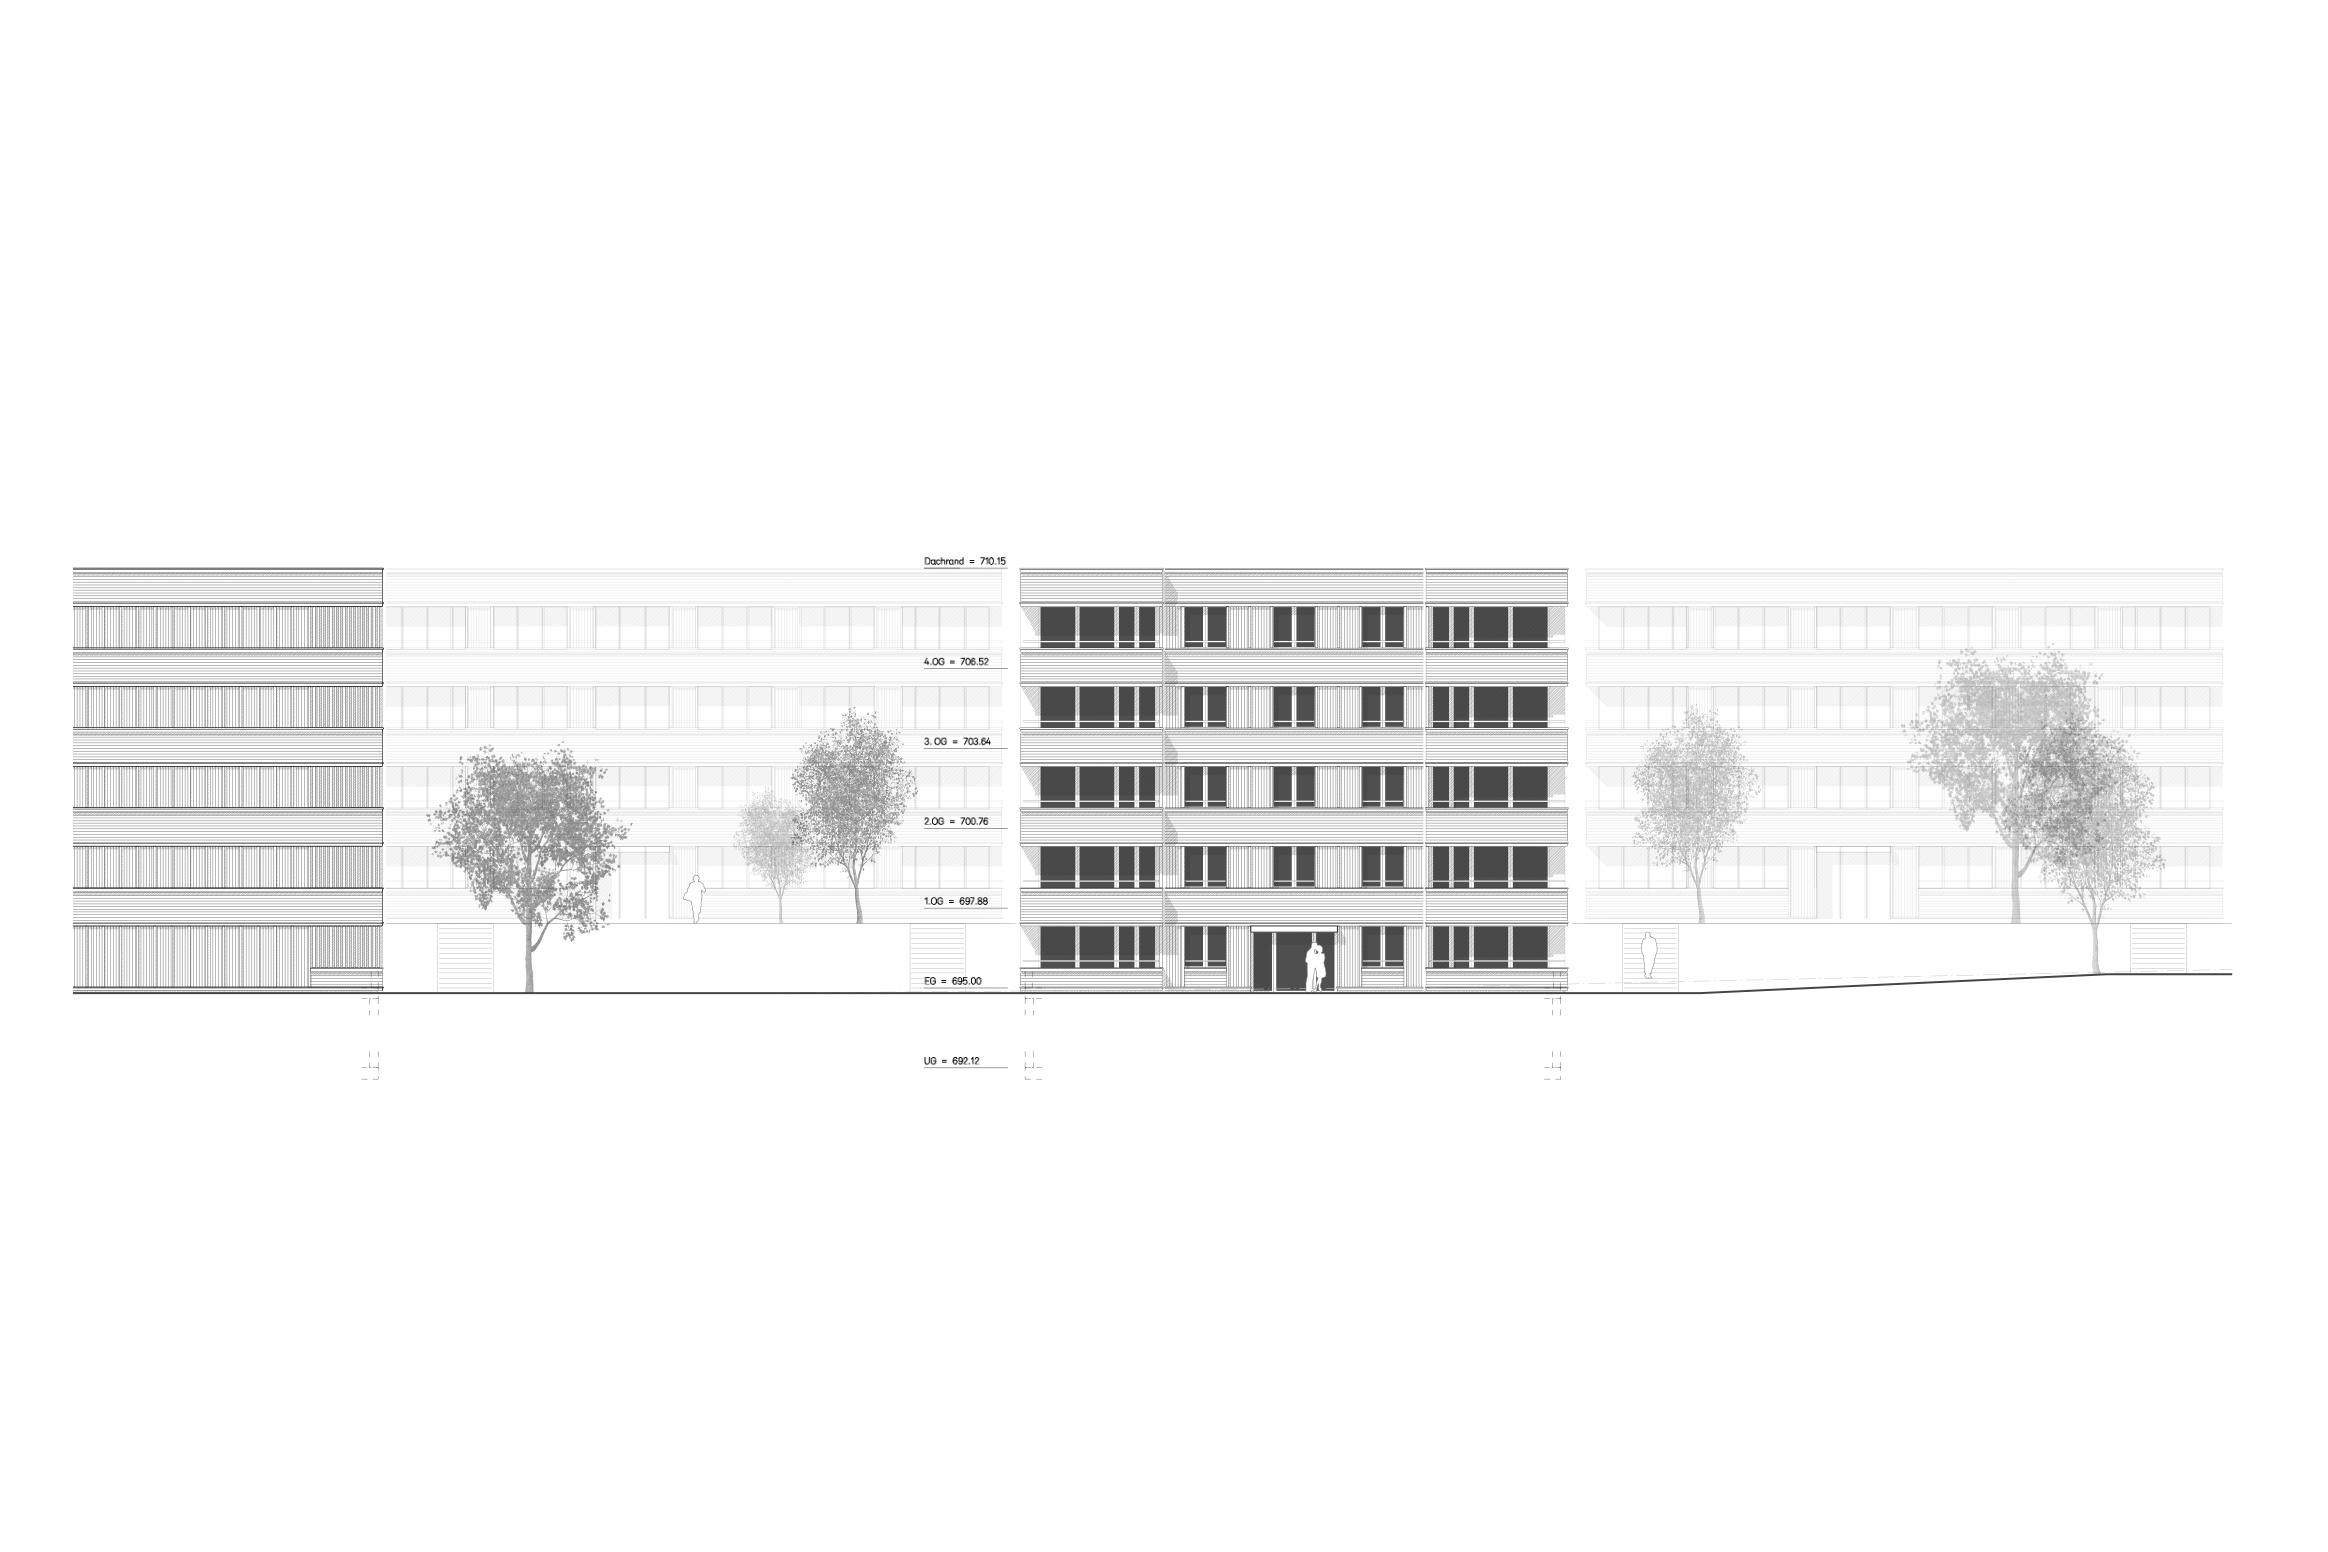 498 5 Westfassade Wohnhäuser